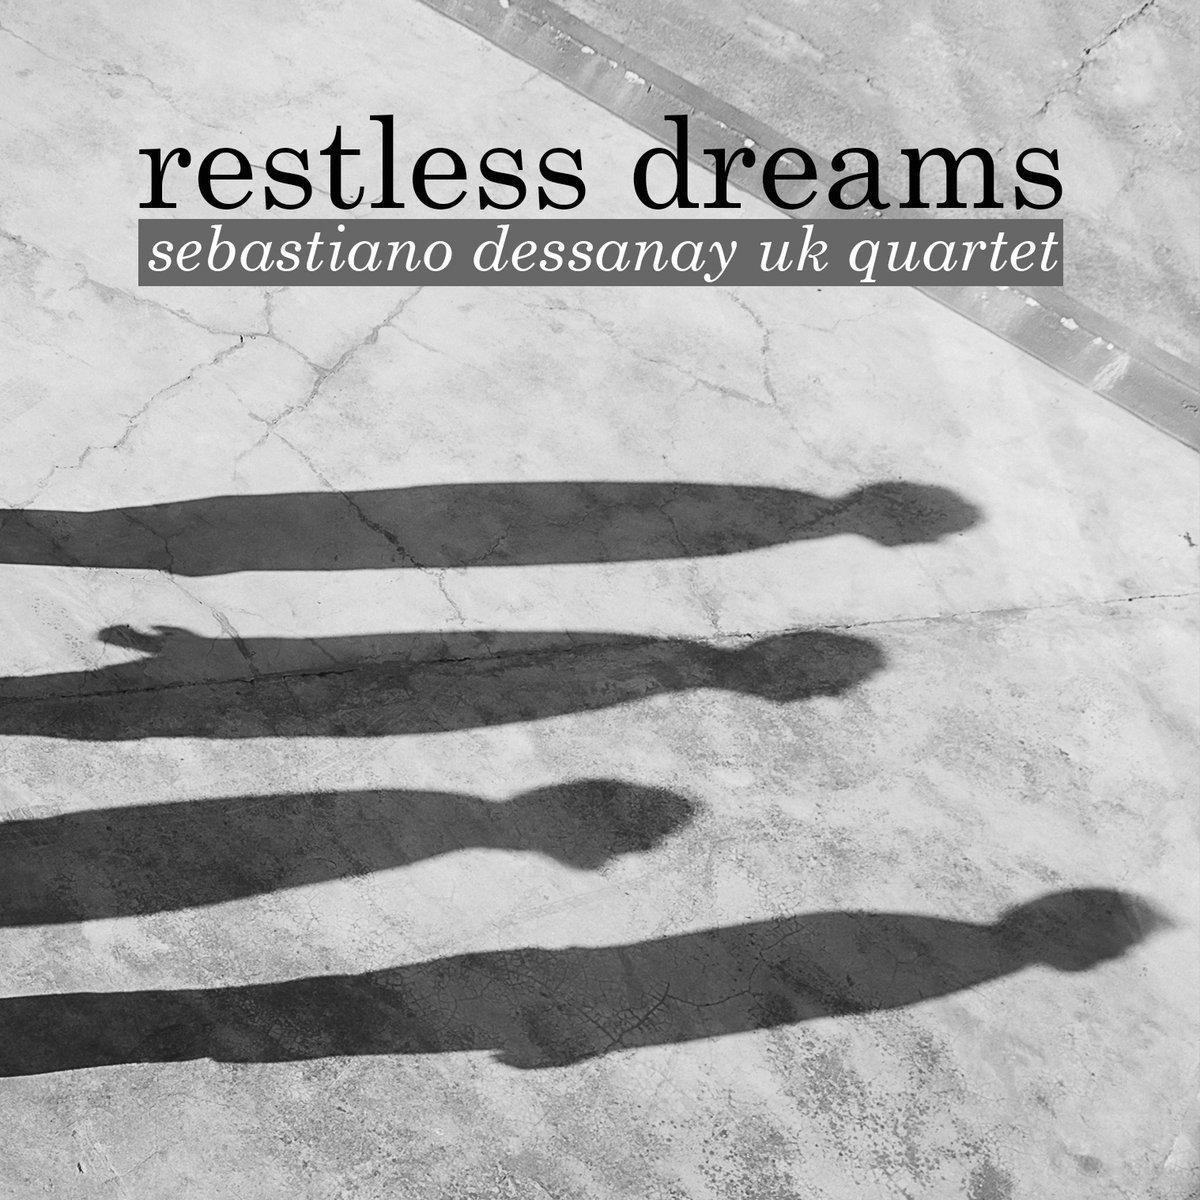 Restless Dreams Cover, Sebastiano Dessanay UK Quartet